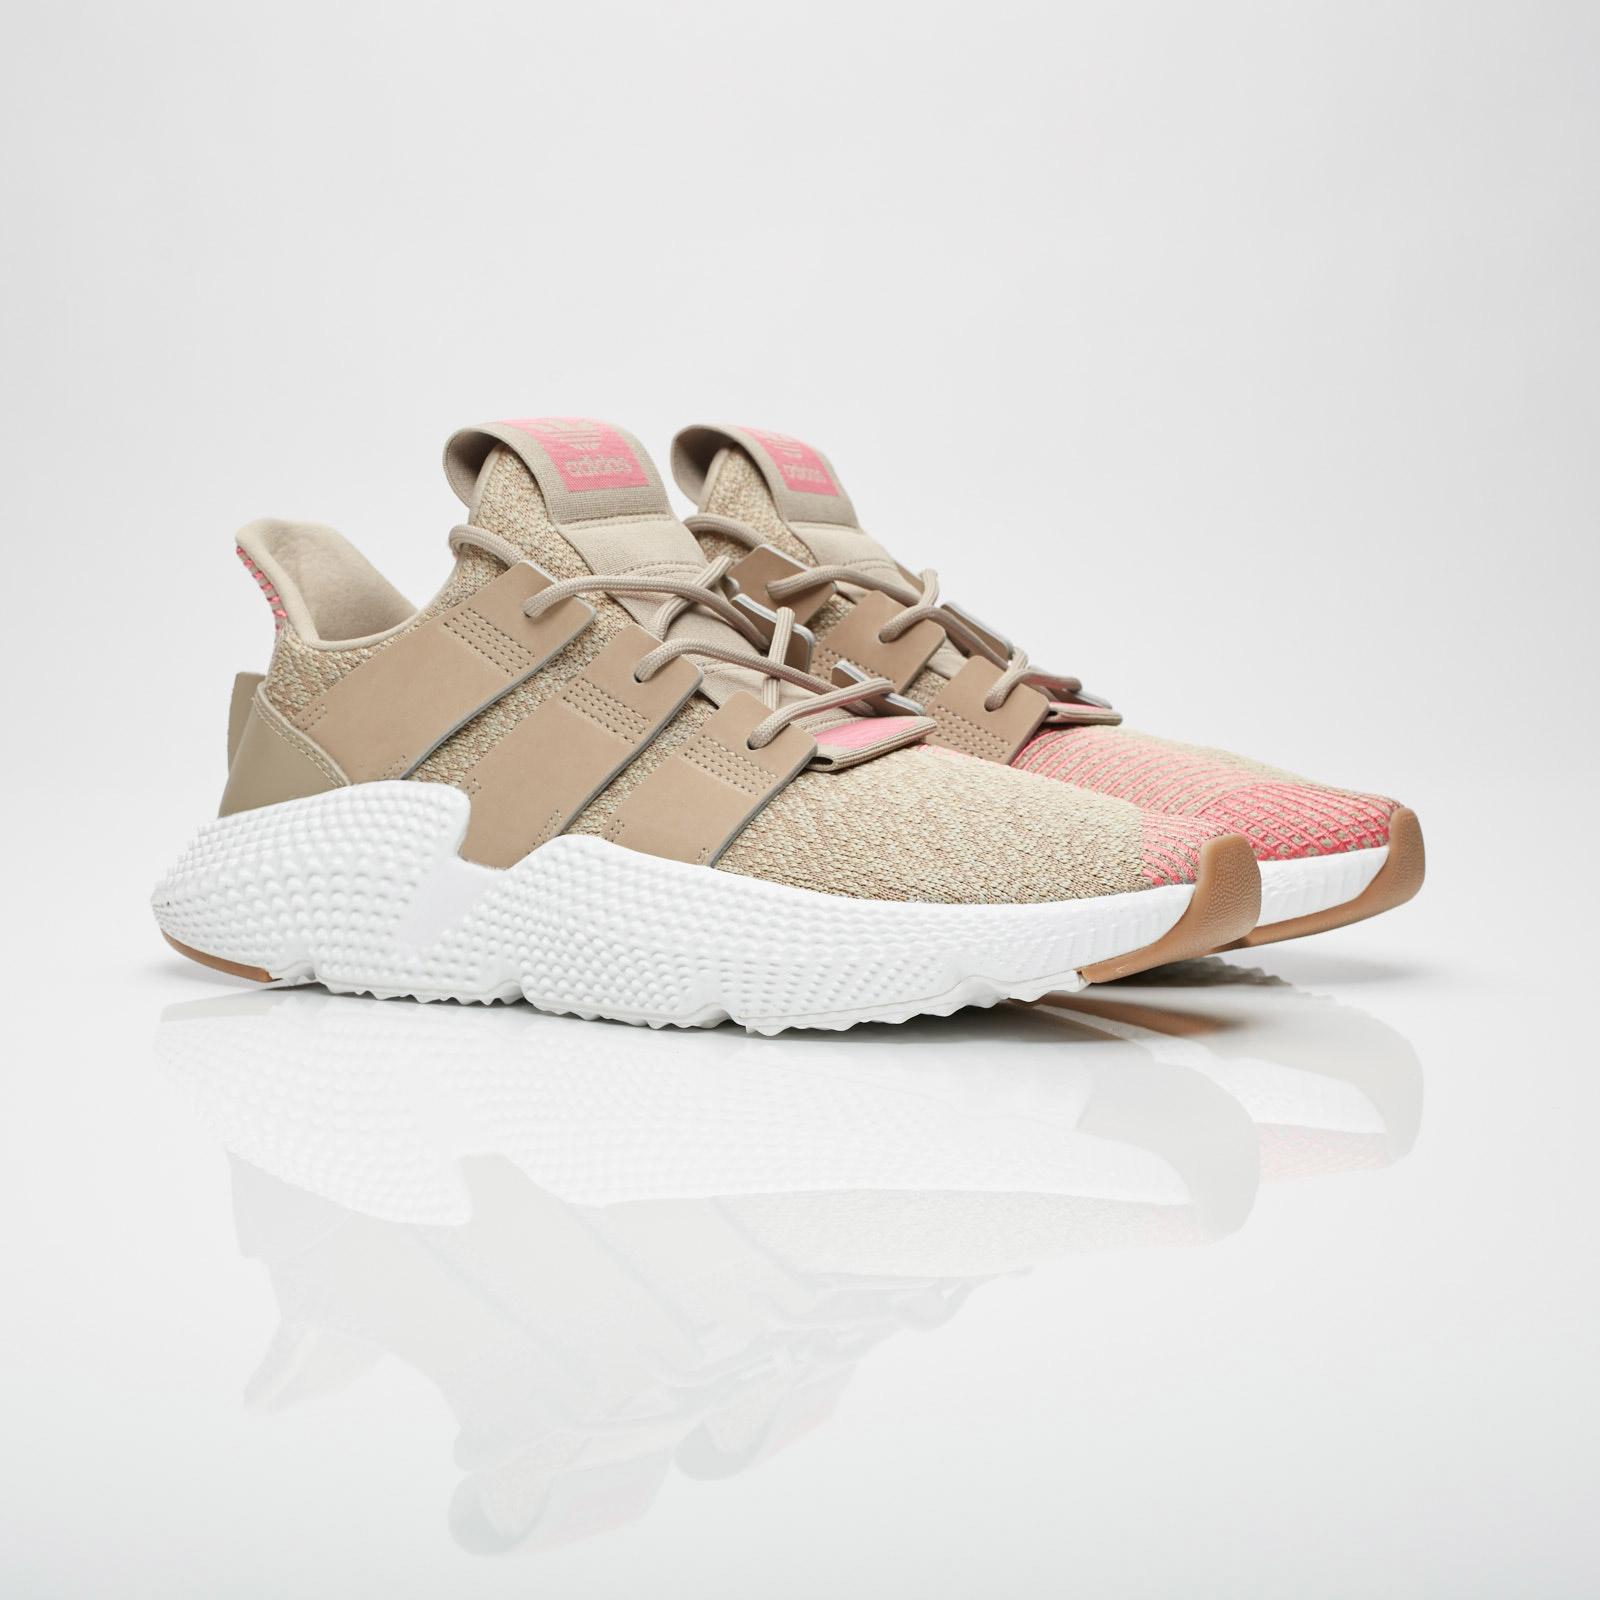 adidas Prophere - Cq2128 - Sneakersnstuff  e52ac6a4c163